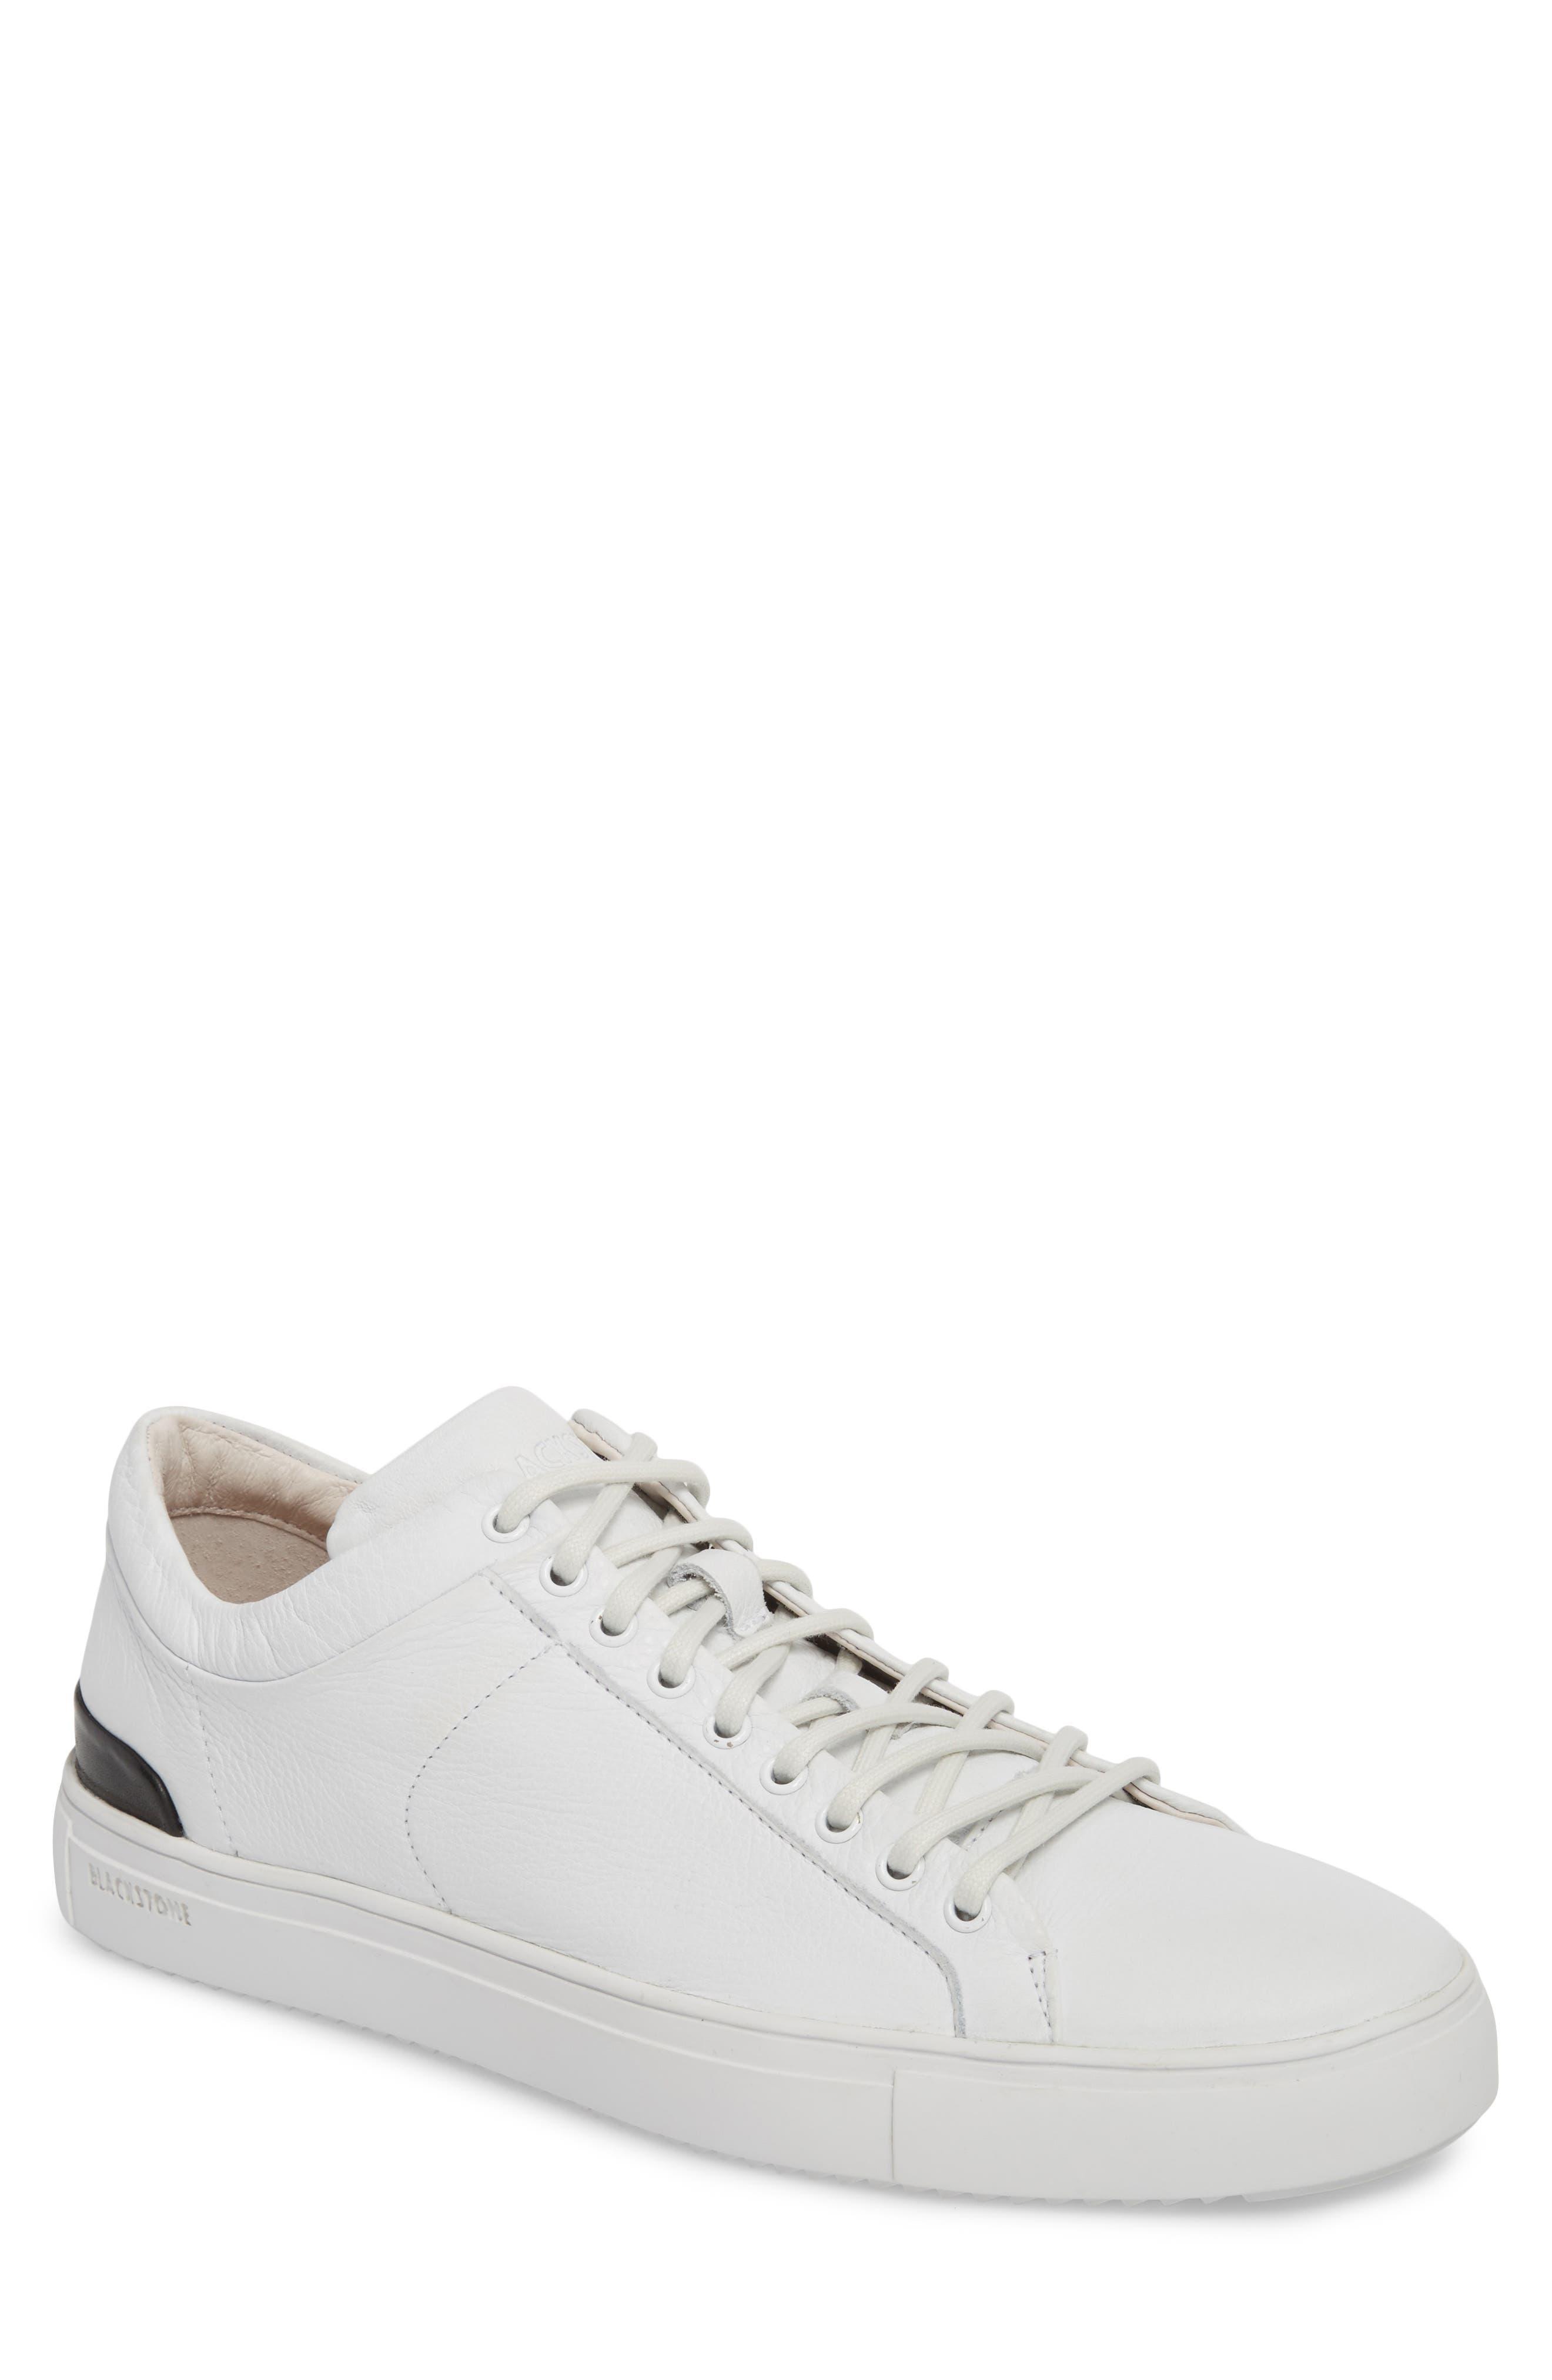 Blackstone PM56 Low Top Sneaker (Men)